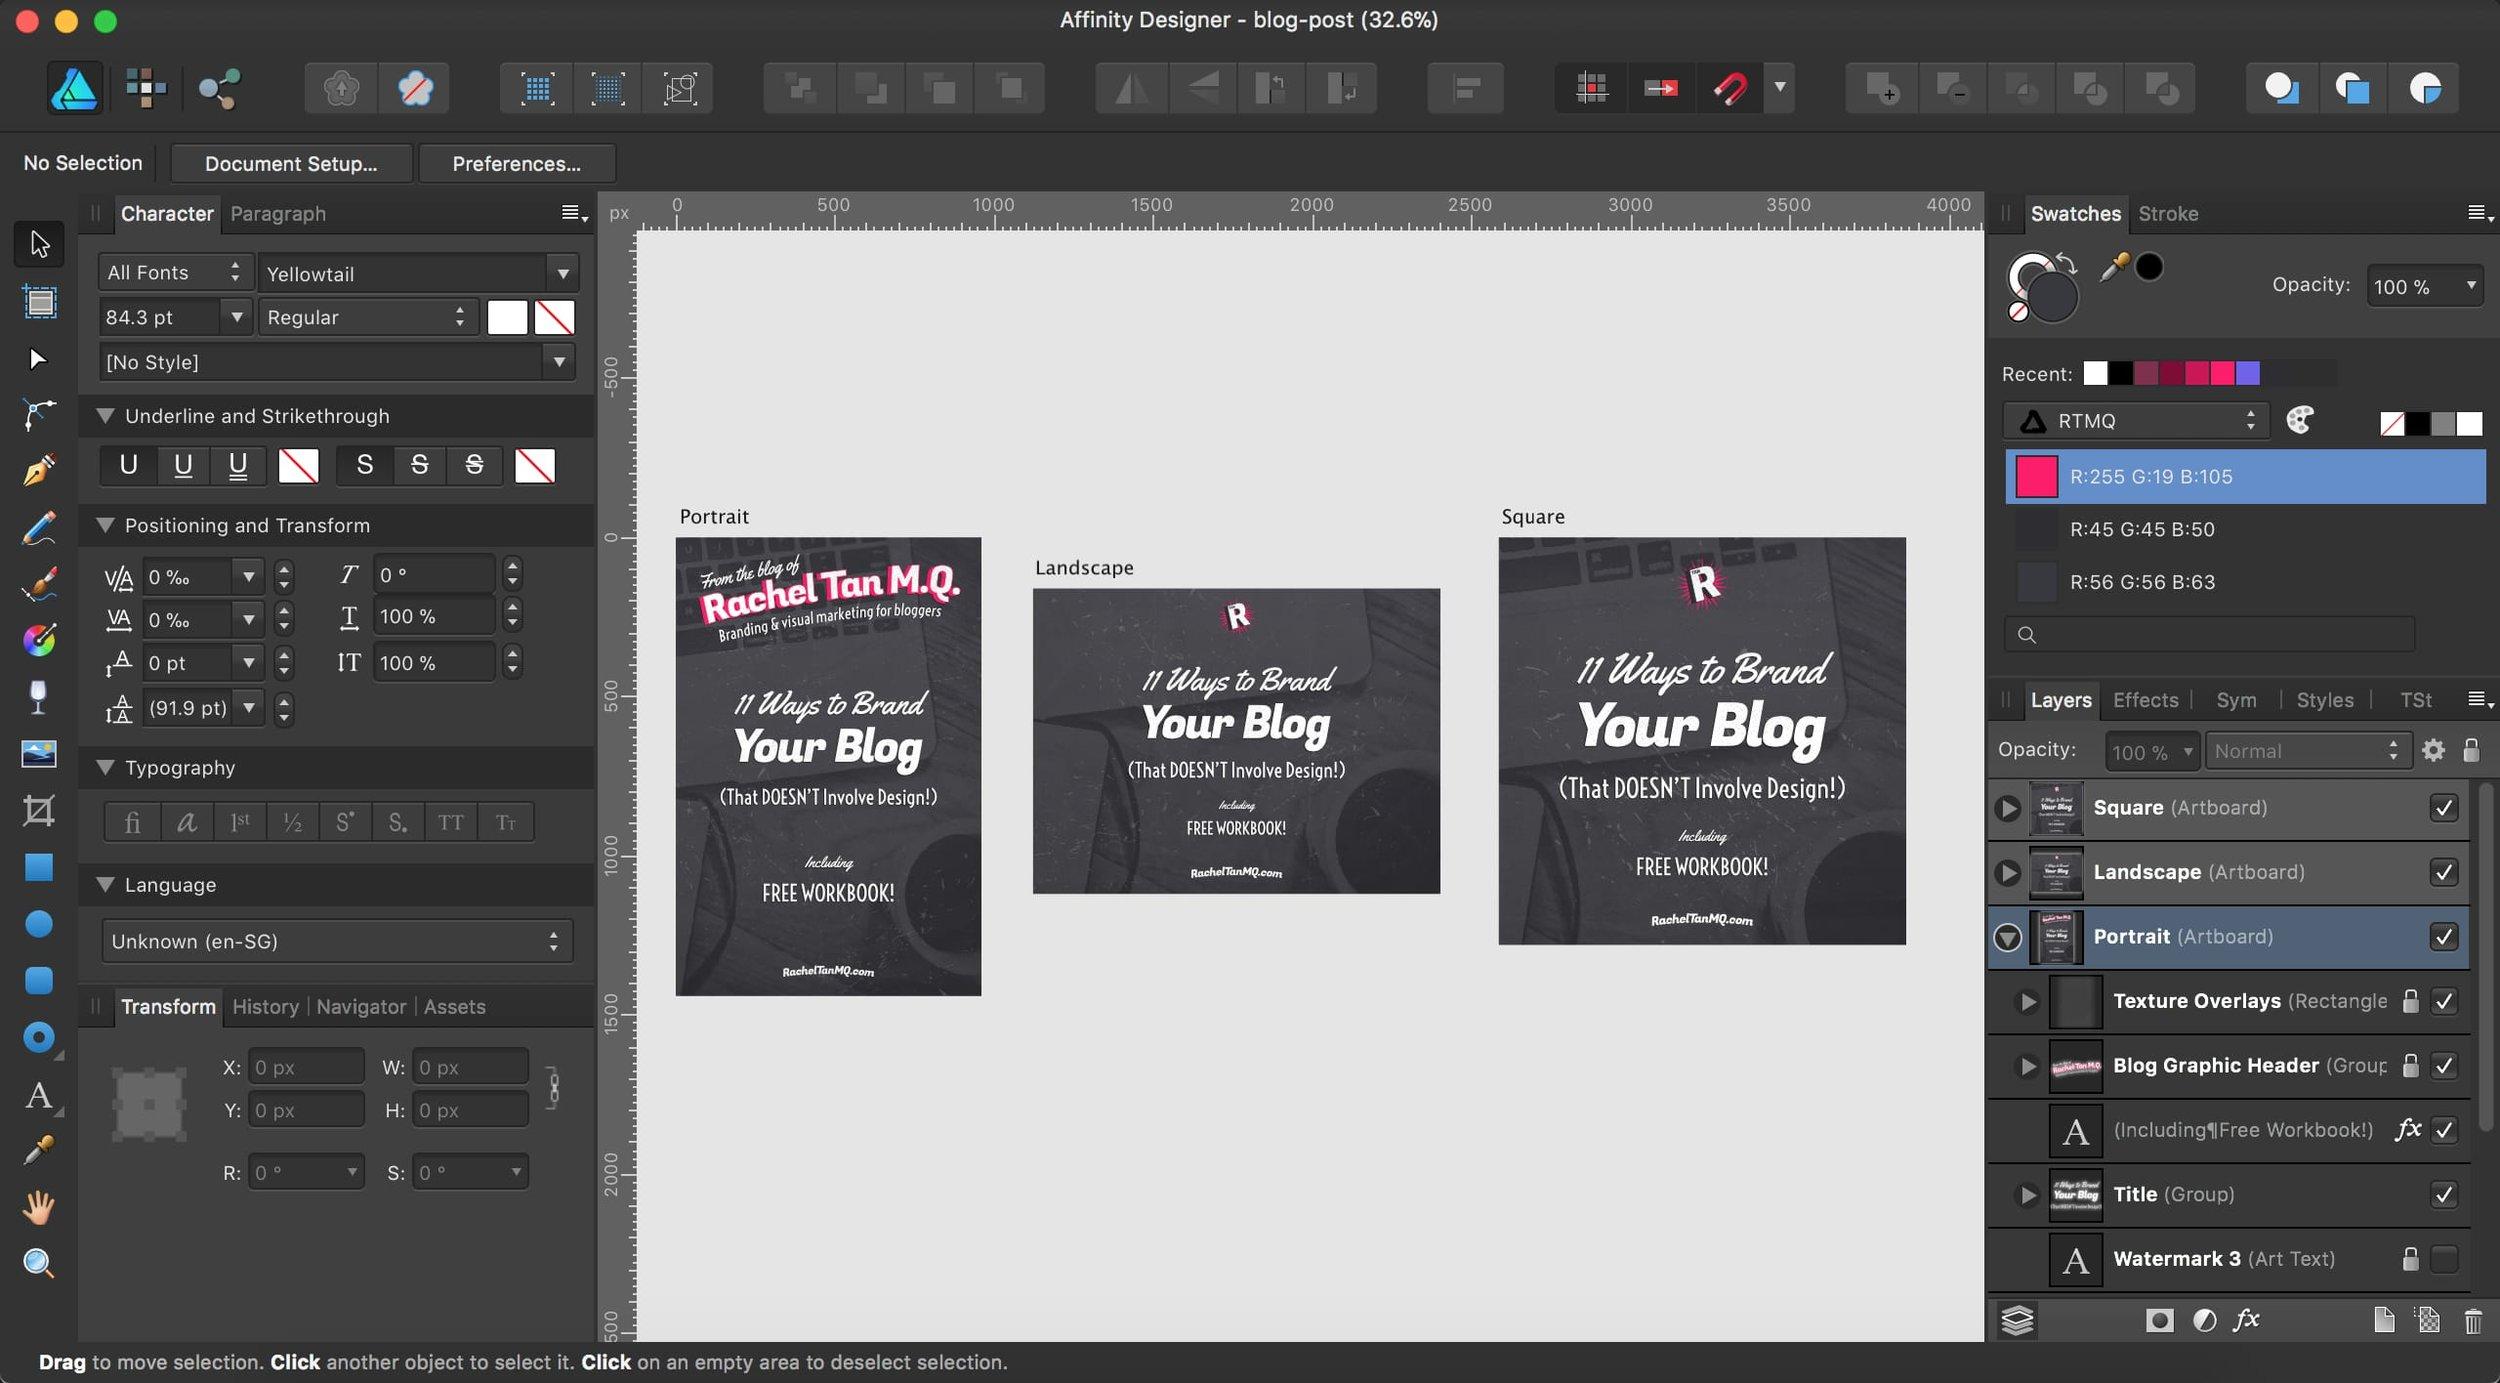 RachelTanMQ.com blog post graphics template in Affinity Designer